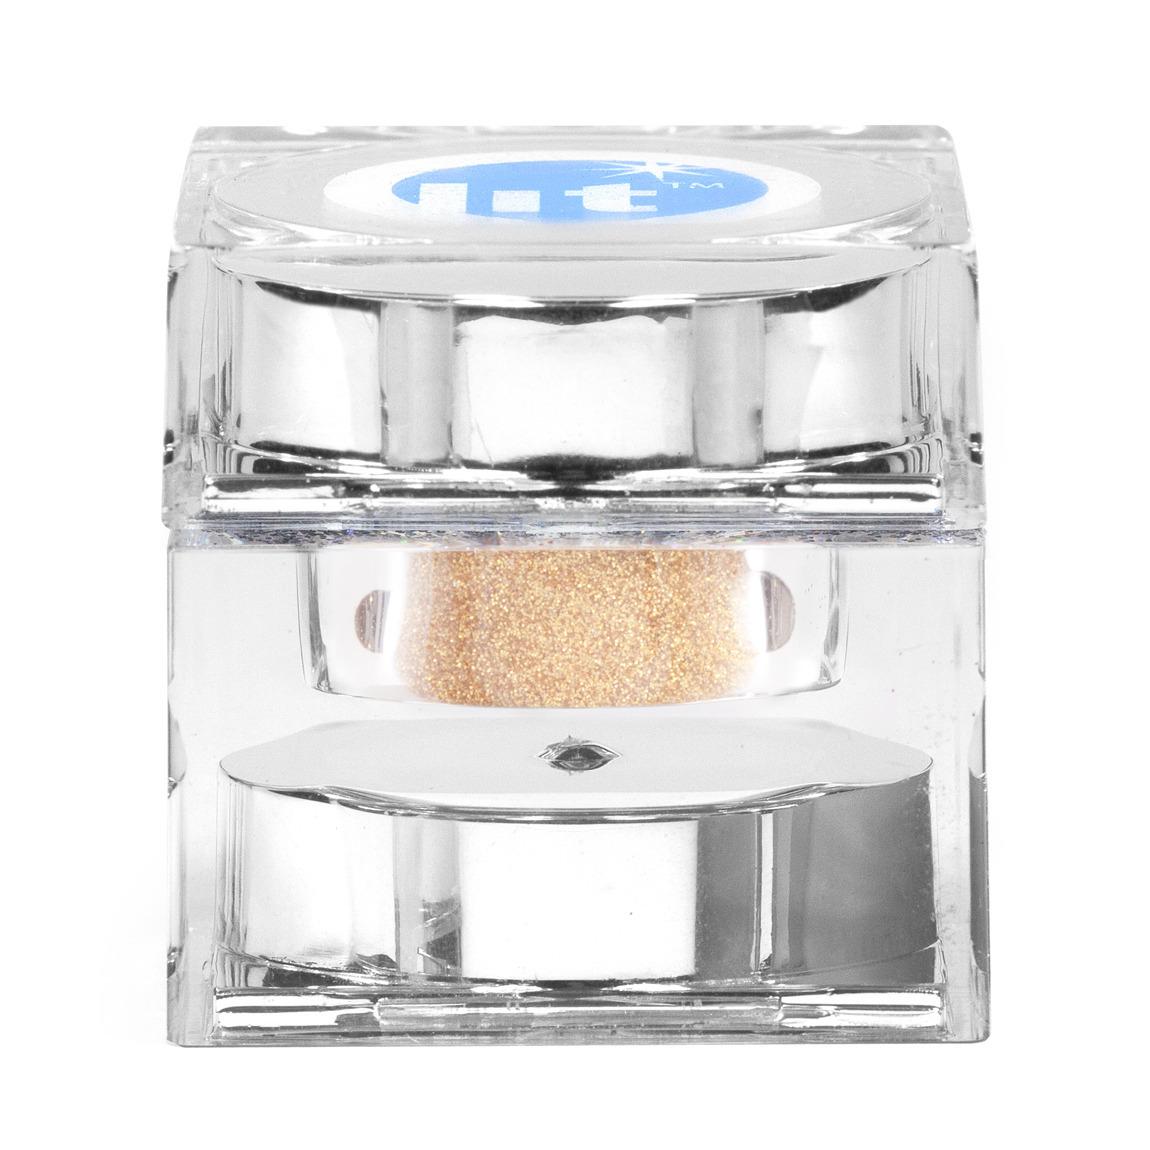 Lit Cosmetics Lit Glitter Liberace S2 alternative view 1.